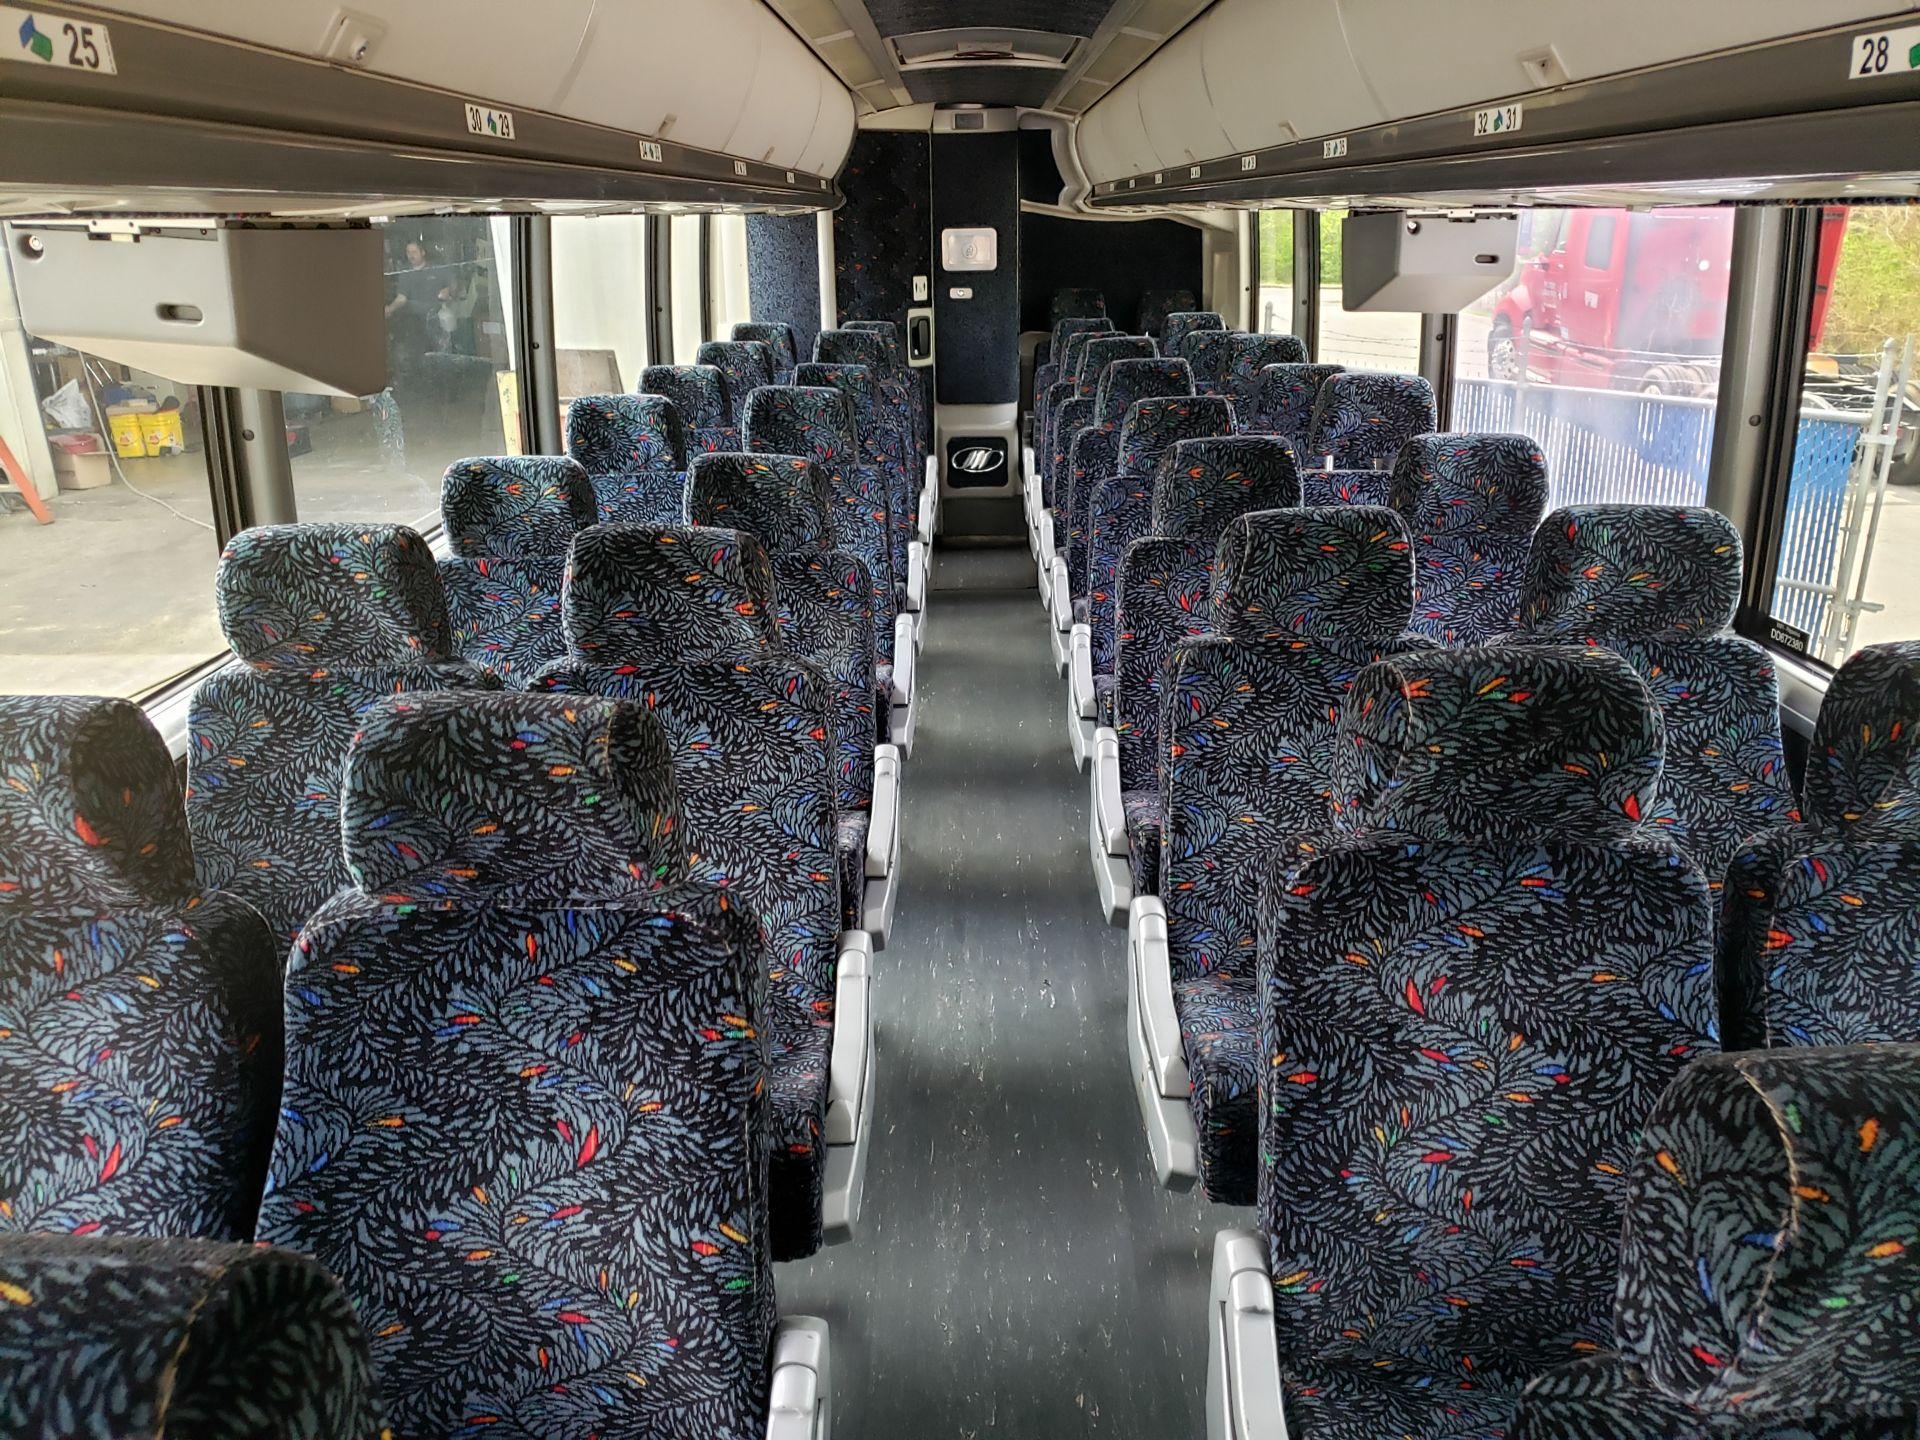 2005 MCI J4500 56-Pass Kneeling Coach Bus - Image 12 of 20